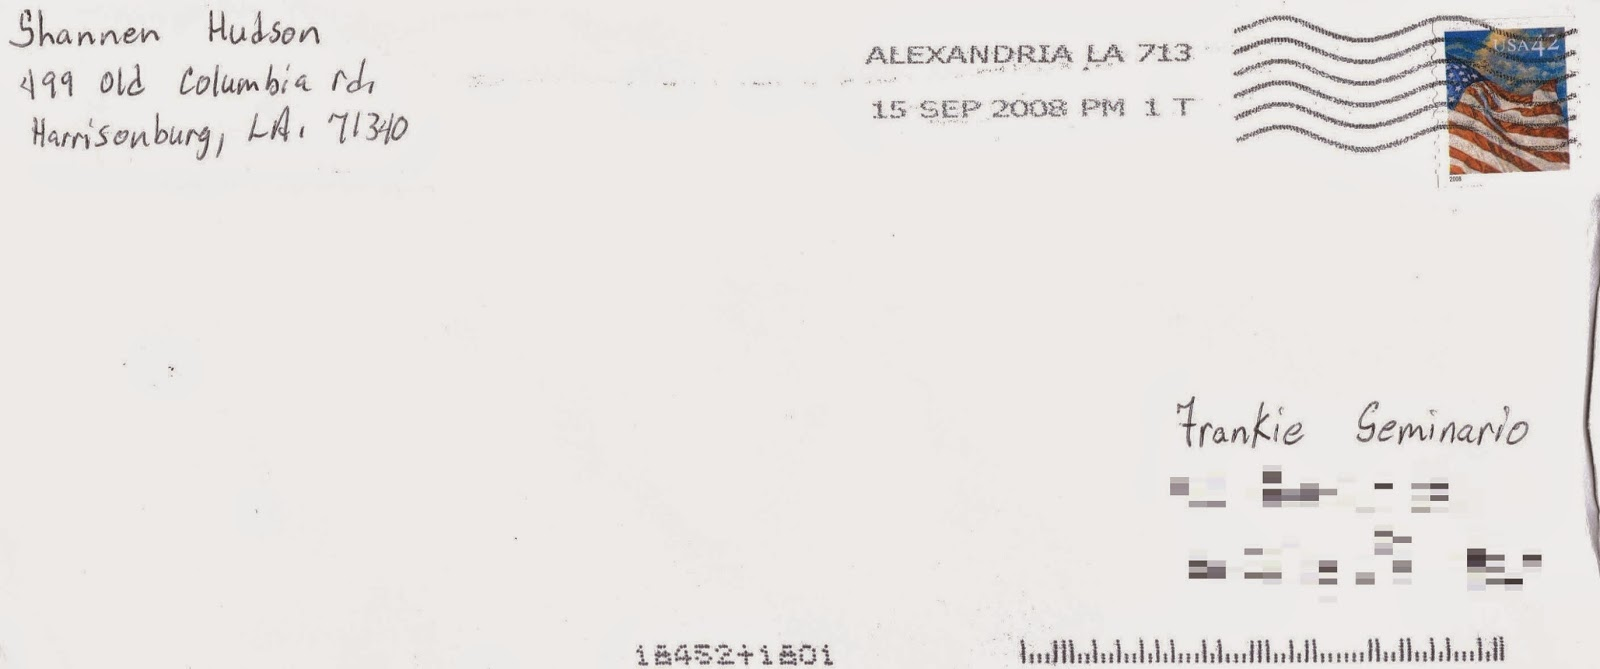 FrankieThaLuckyDog'z Block (CD Reviewz, Videos, Louisiana